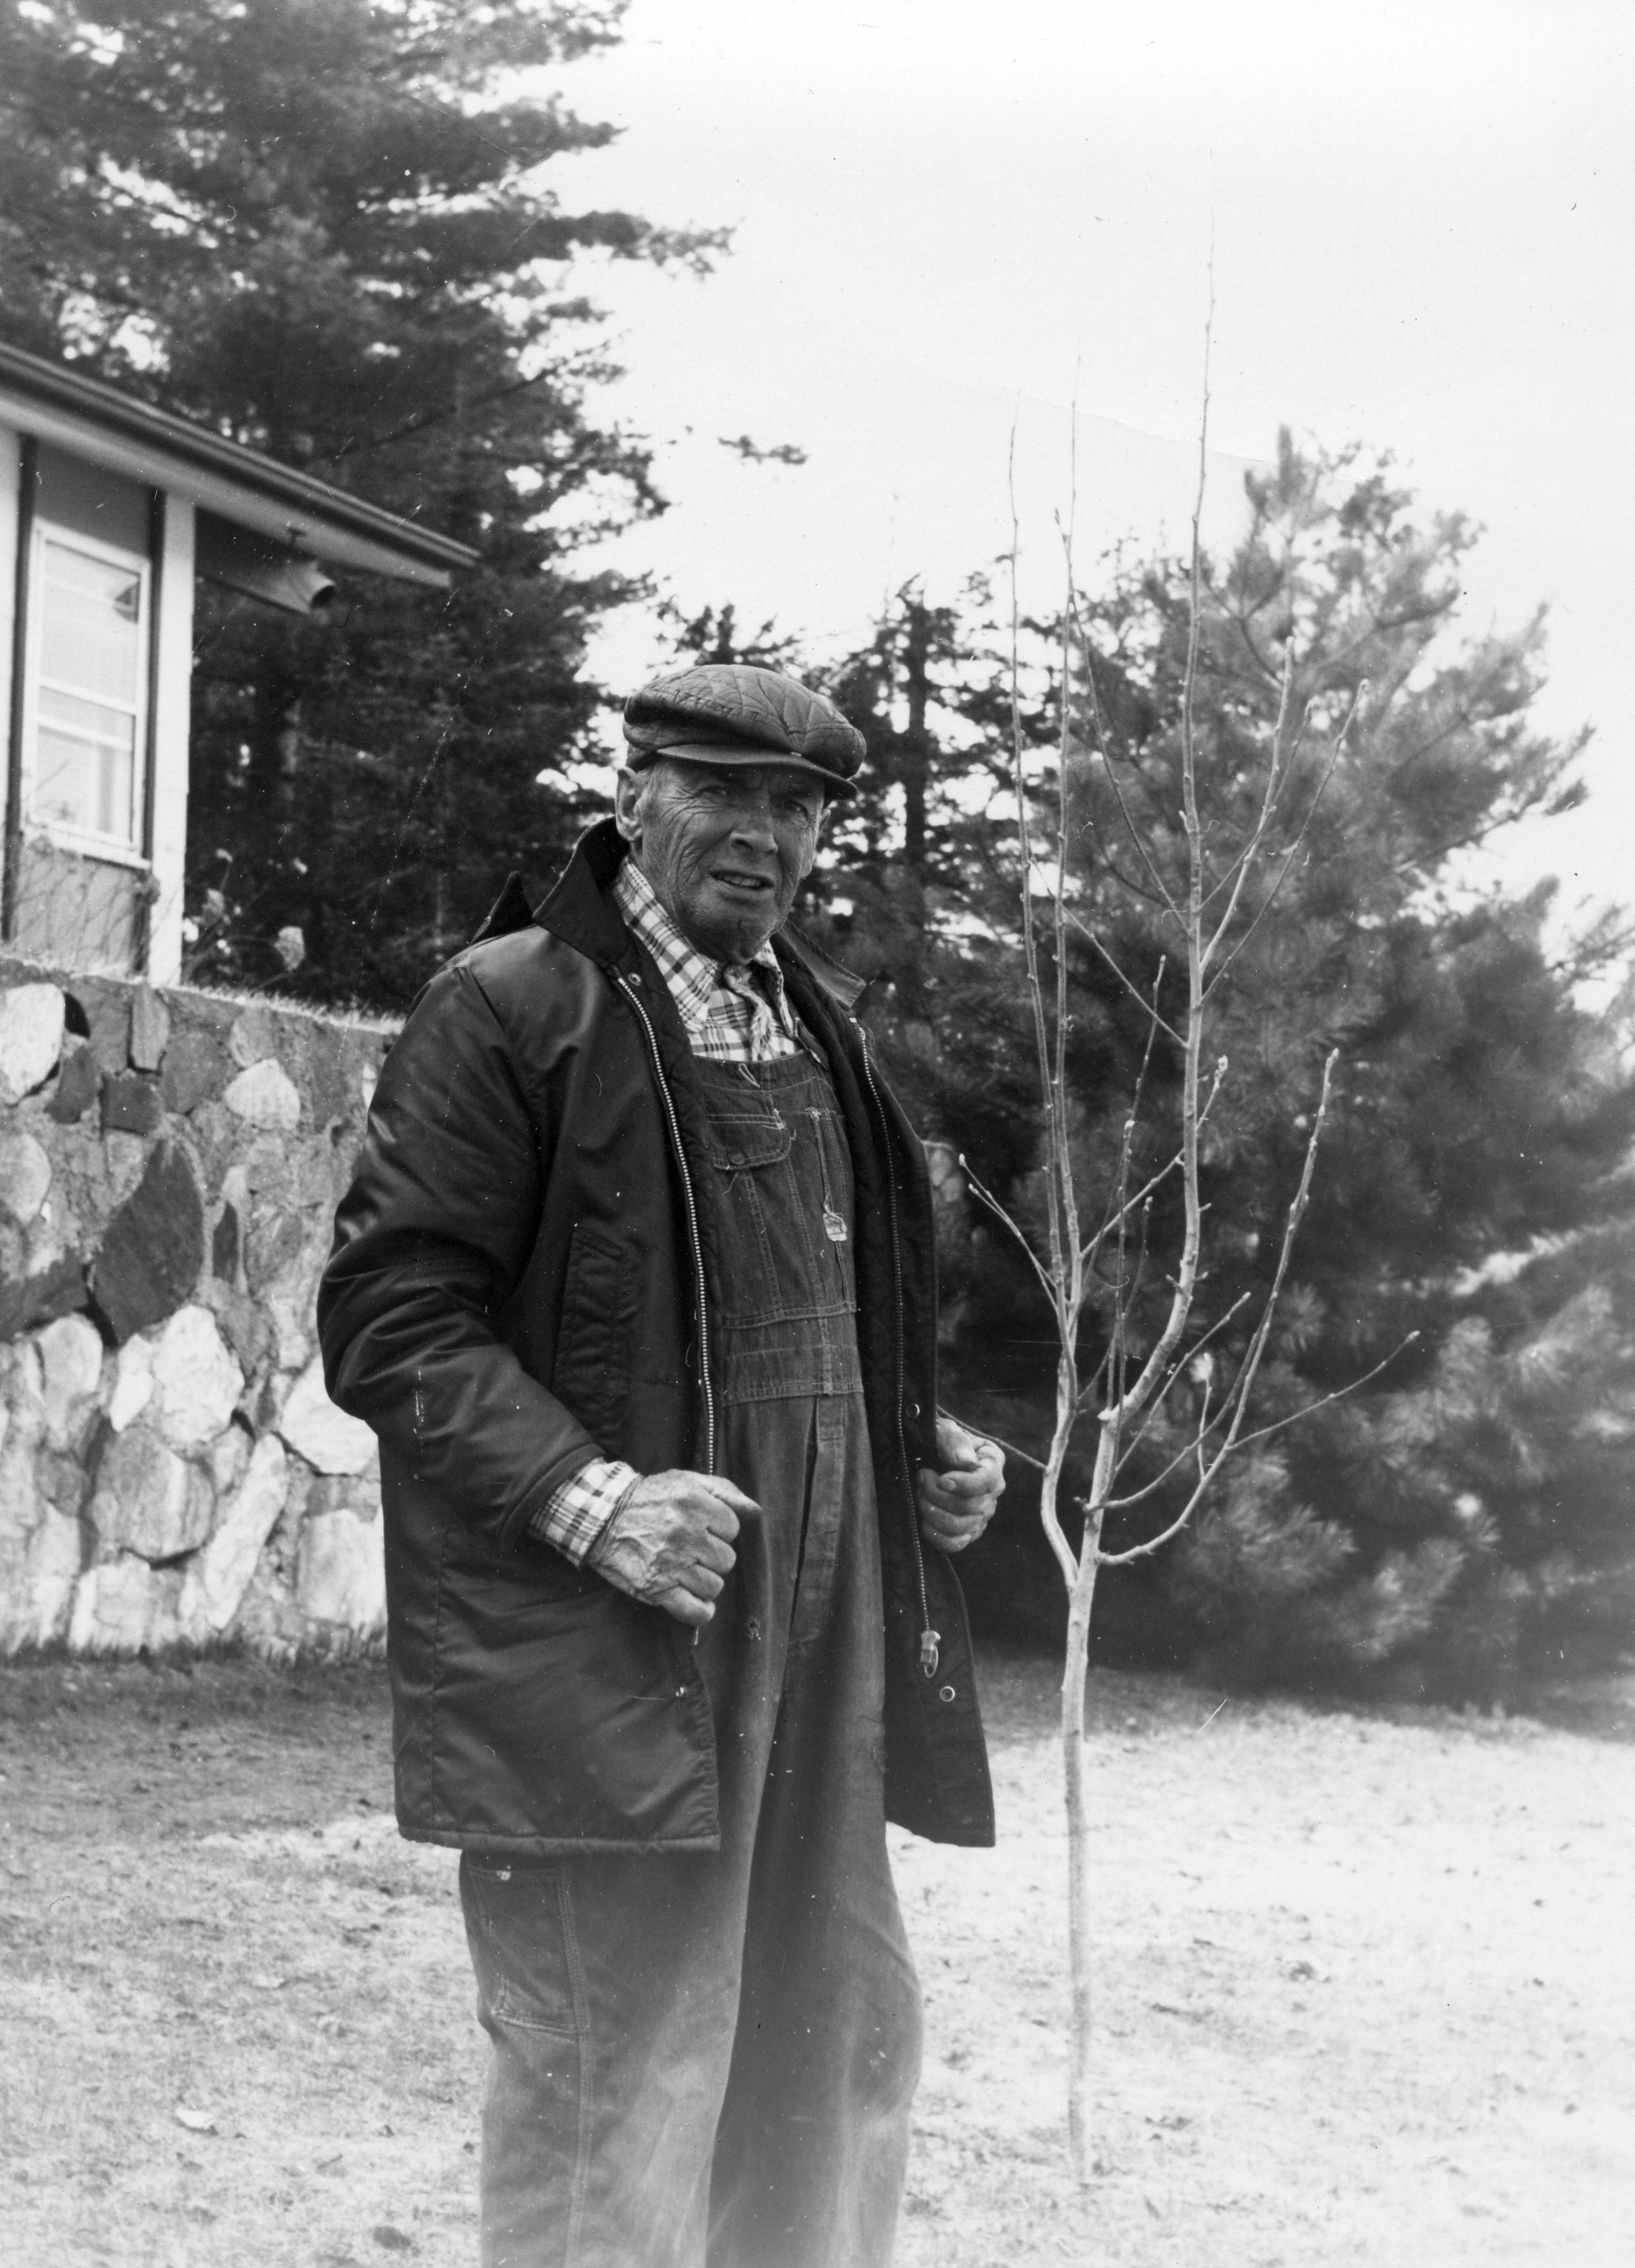 Henri Adolphe Durand